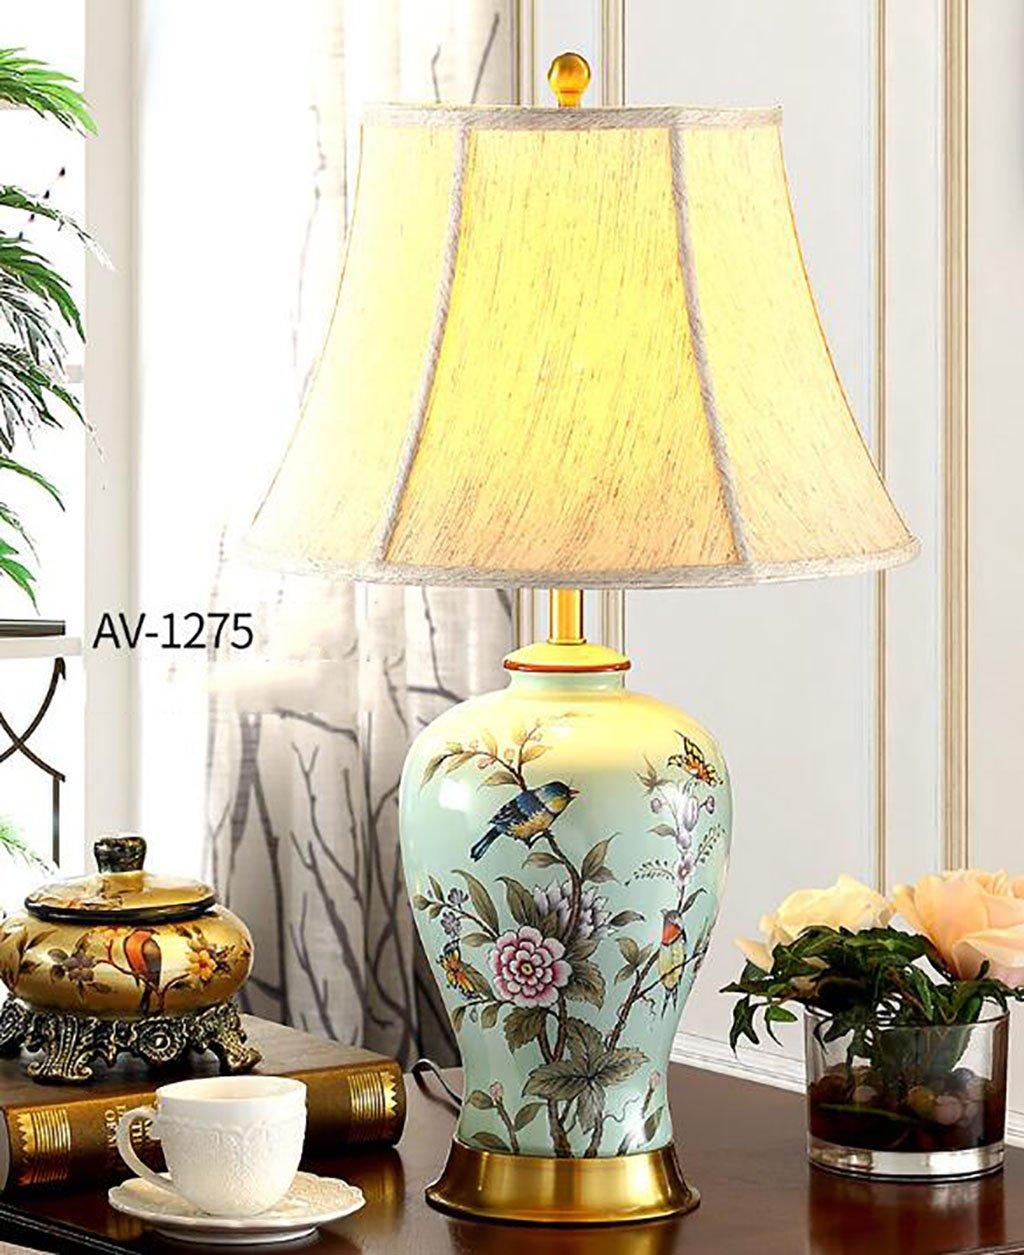 KTYX 手描きの花と鳥の青オール銅の陶磁器のランプ 電気スタンド (サイズ さいず : L l) L l  B07CZGHVFT